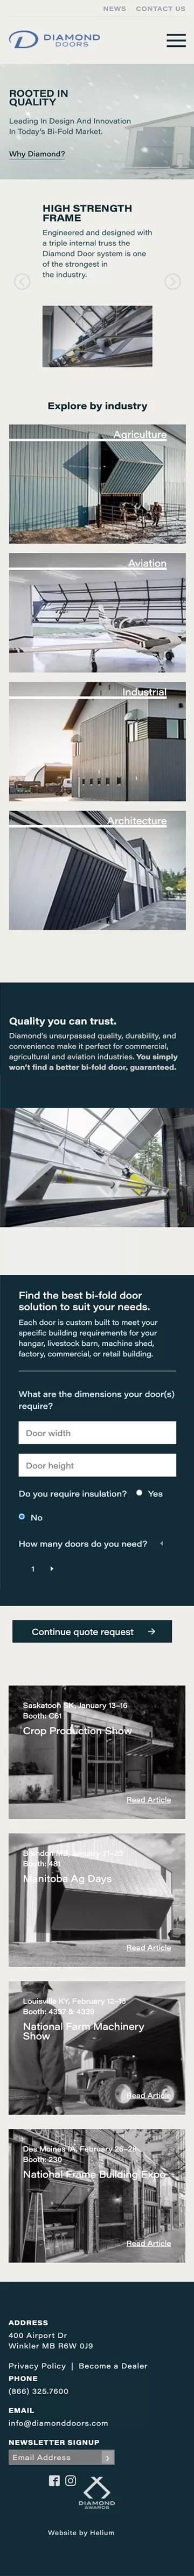 diamond doors website's home page screenshot on mobile device